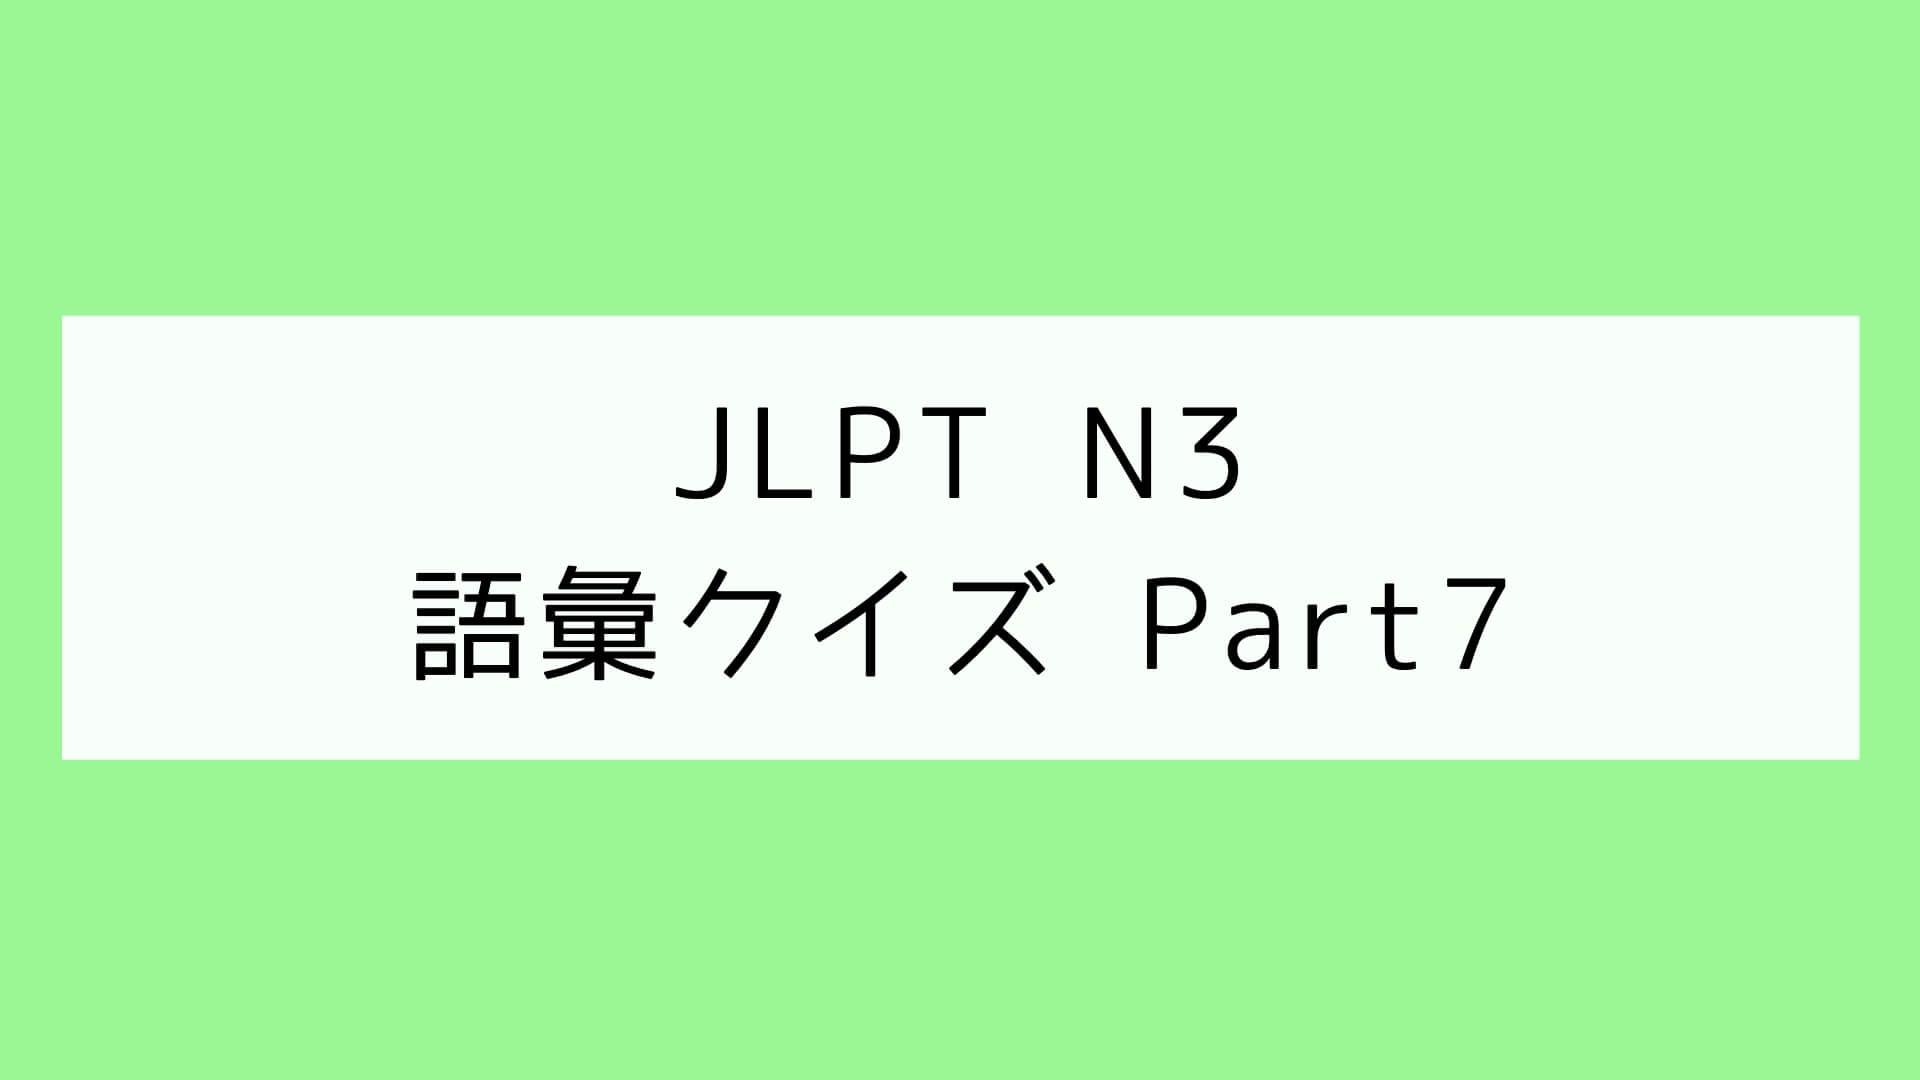 【JLPT N3】語彙クイズ Part7